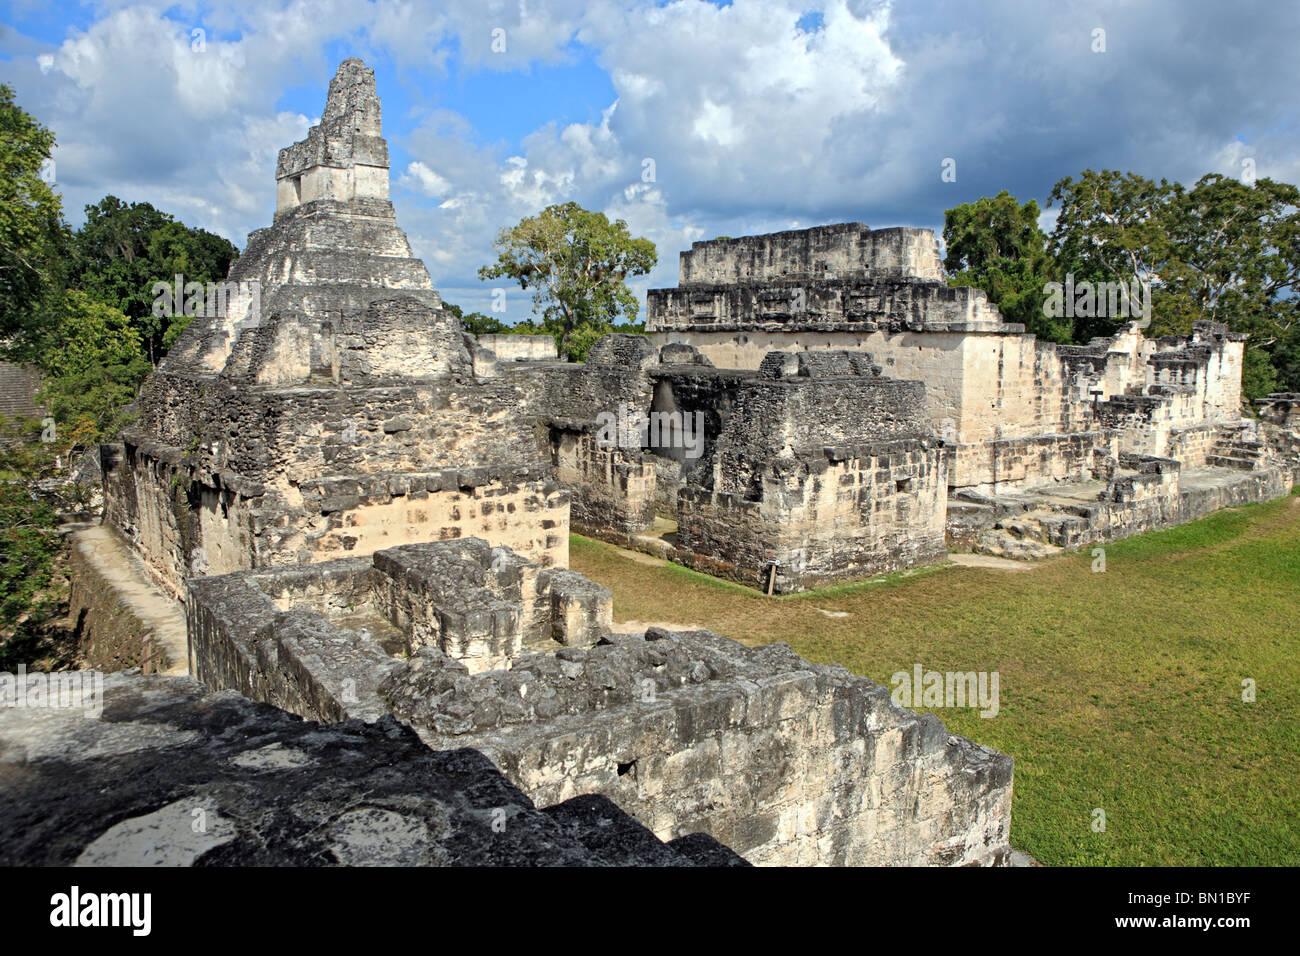 Central Acropolis, Maya ruins of Tikal, near Flores, Guatemala - Stock Image